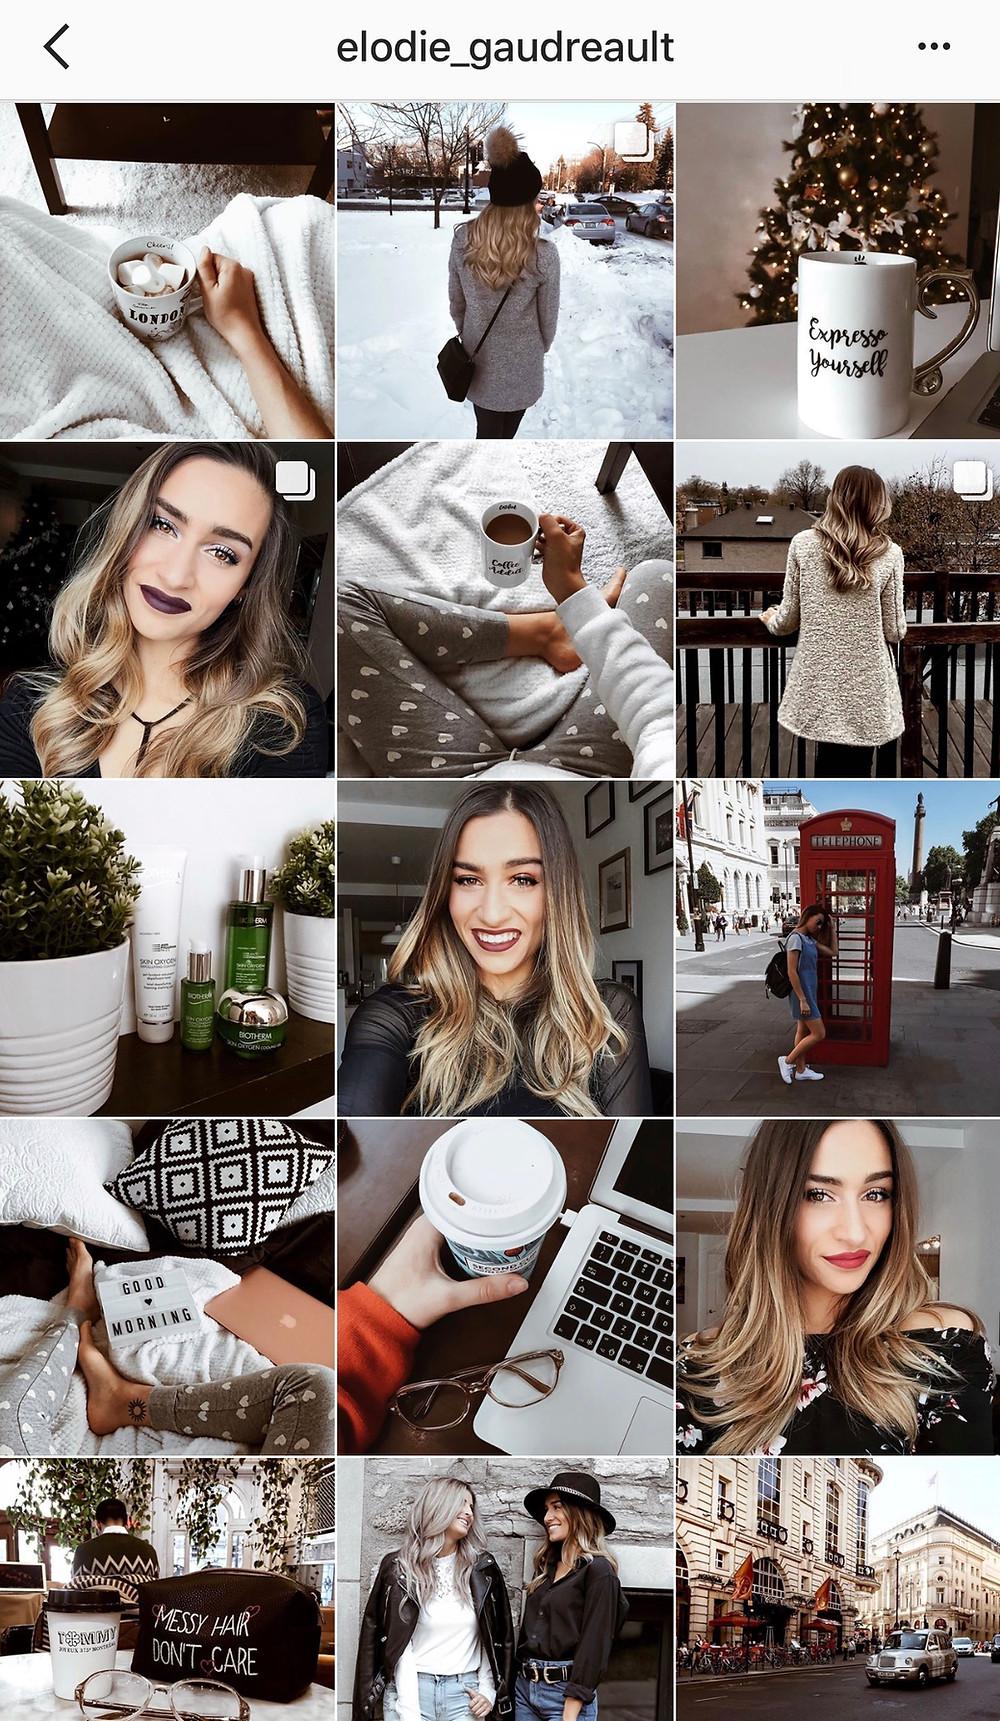 elodie_gaudreault sur Instagram